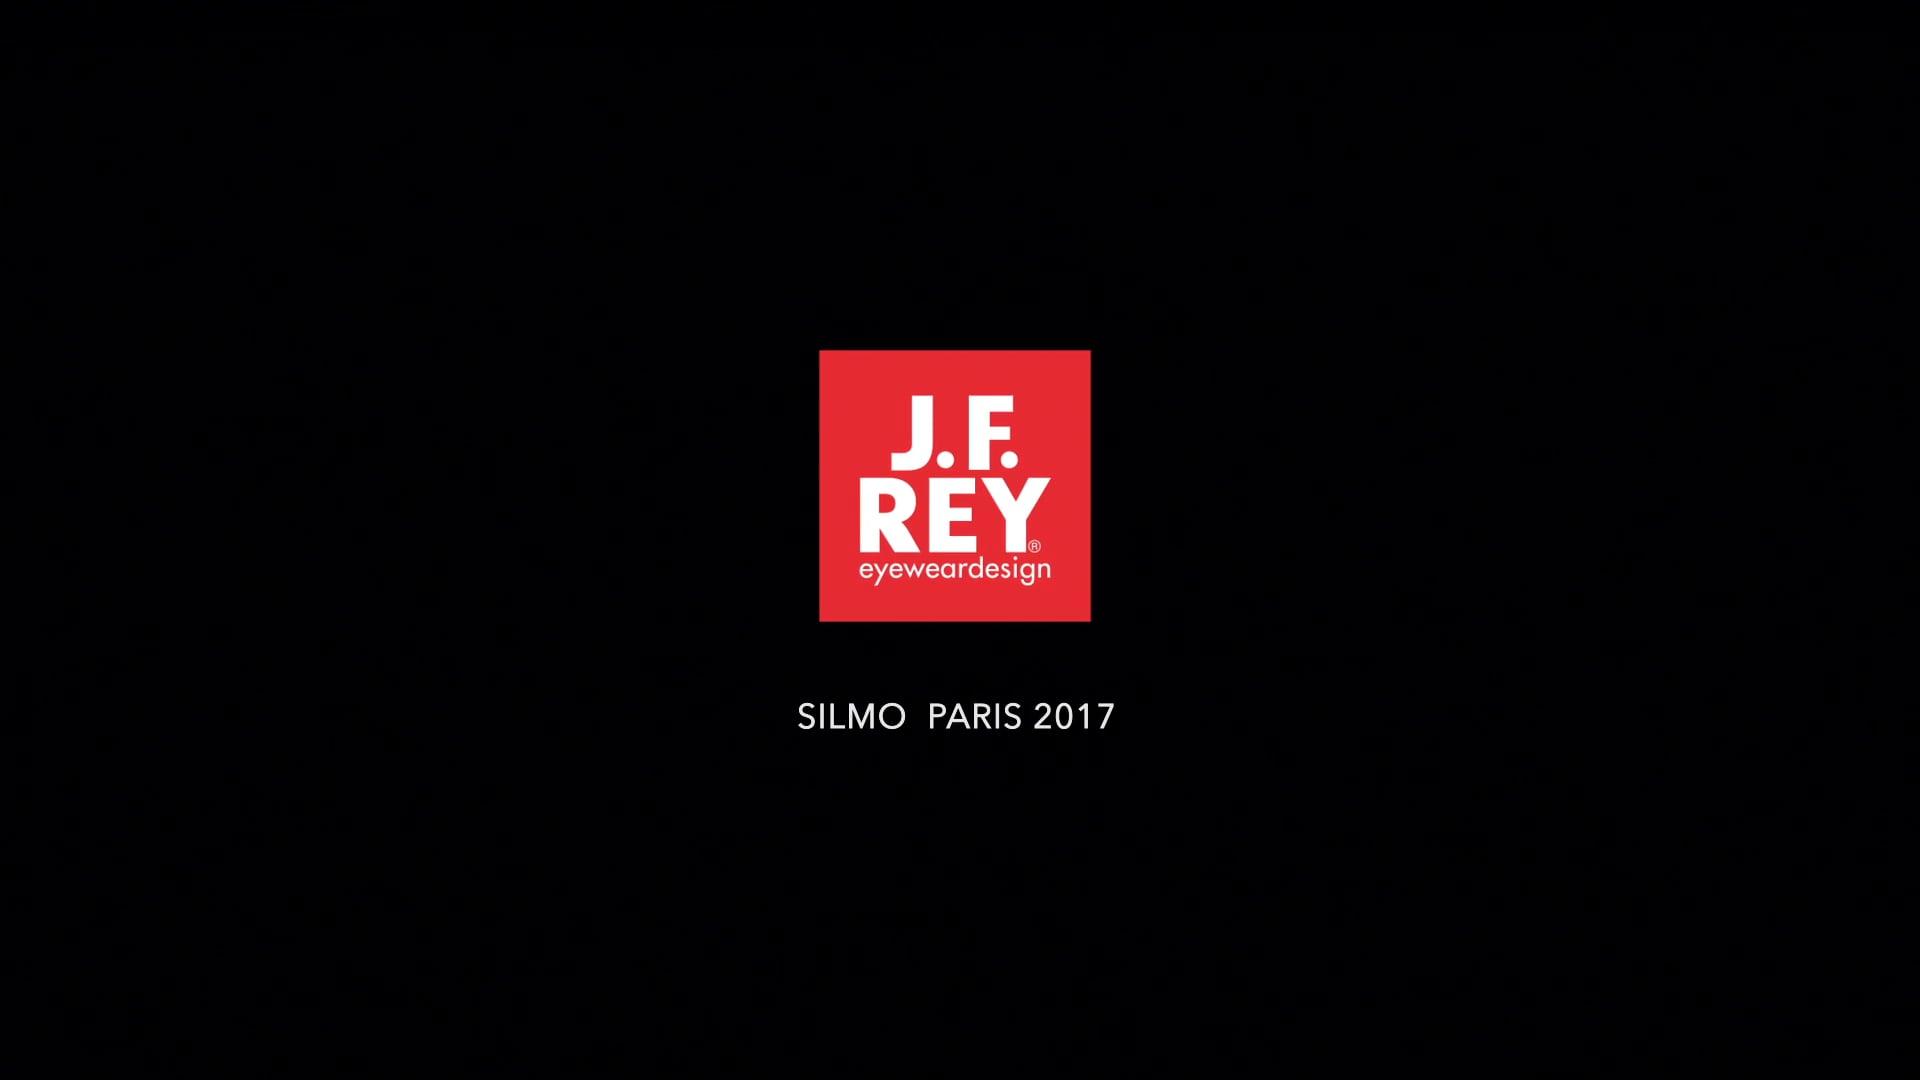 J.F.REY - Silmo